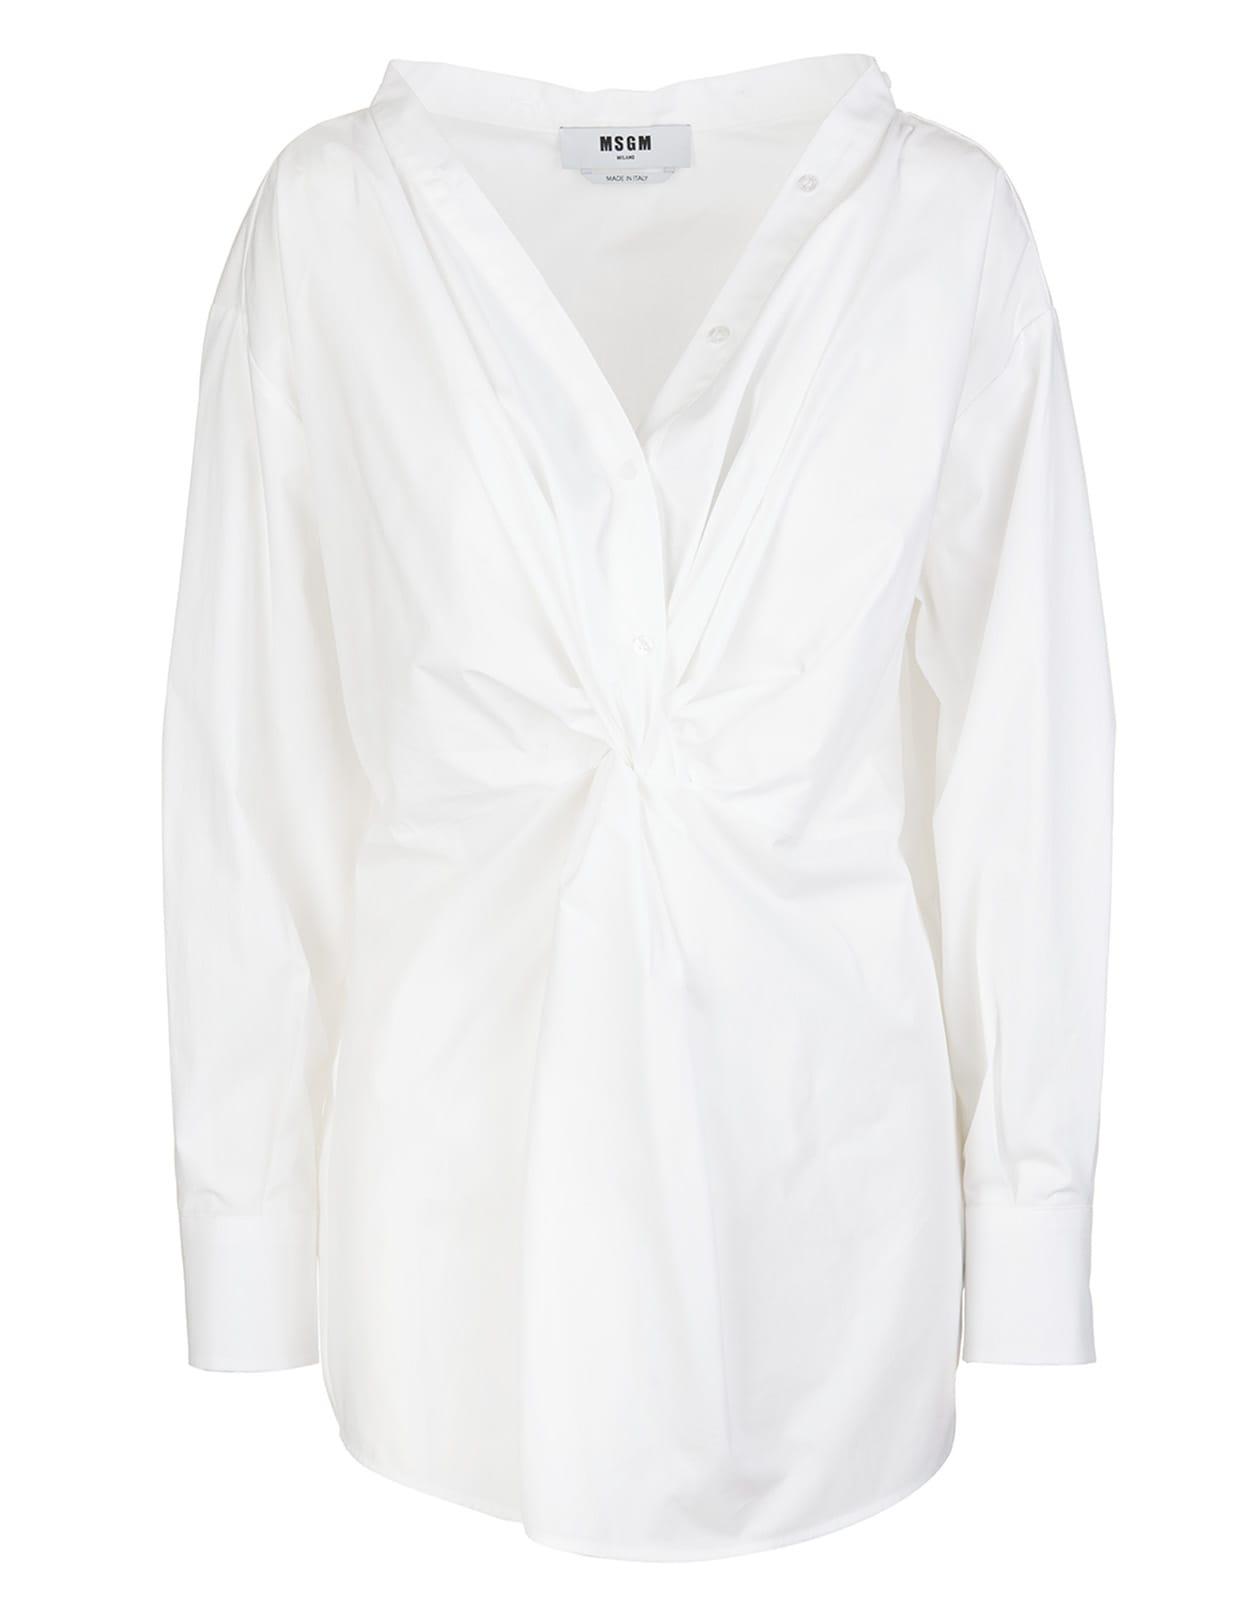 Msgm Cottons WHITE COTTON KNOT-DETAIL V-NECK BLOUSE